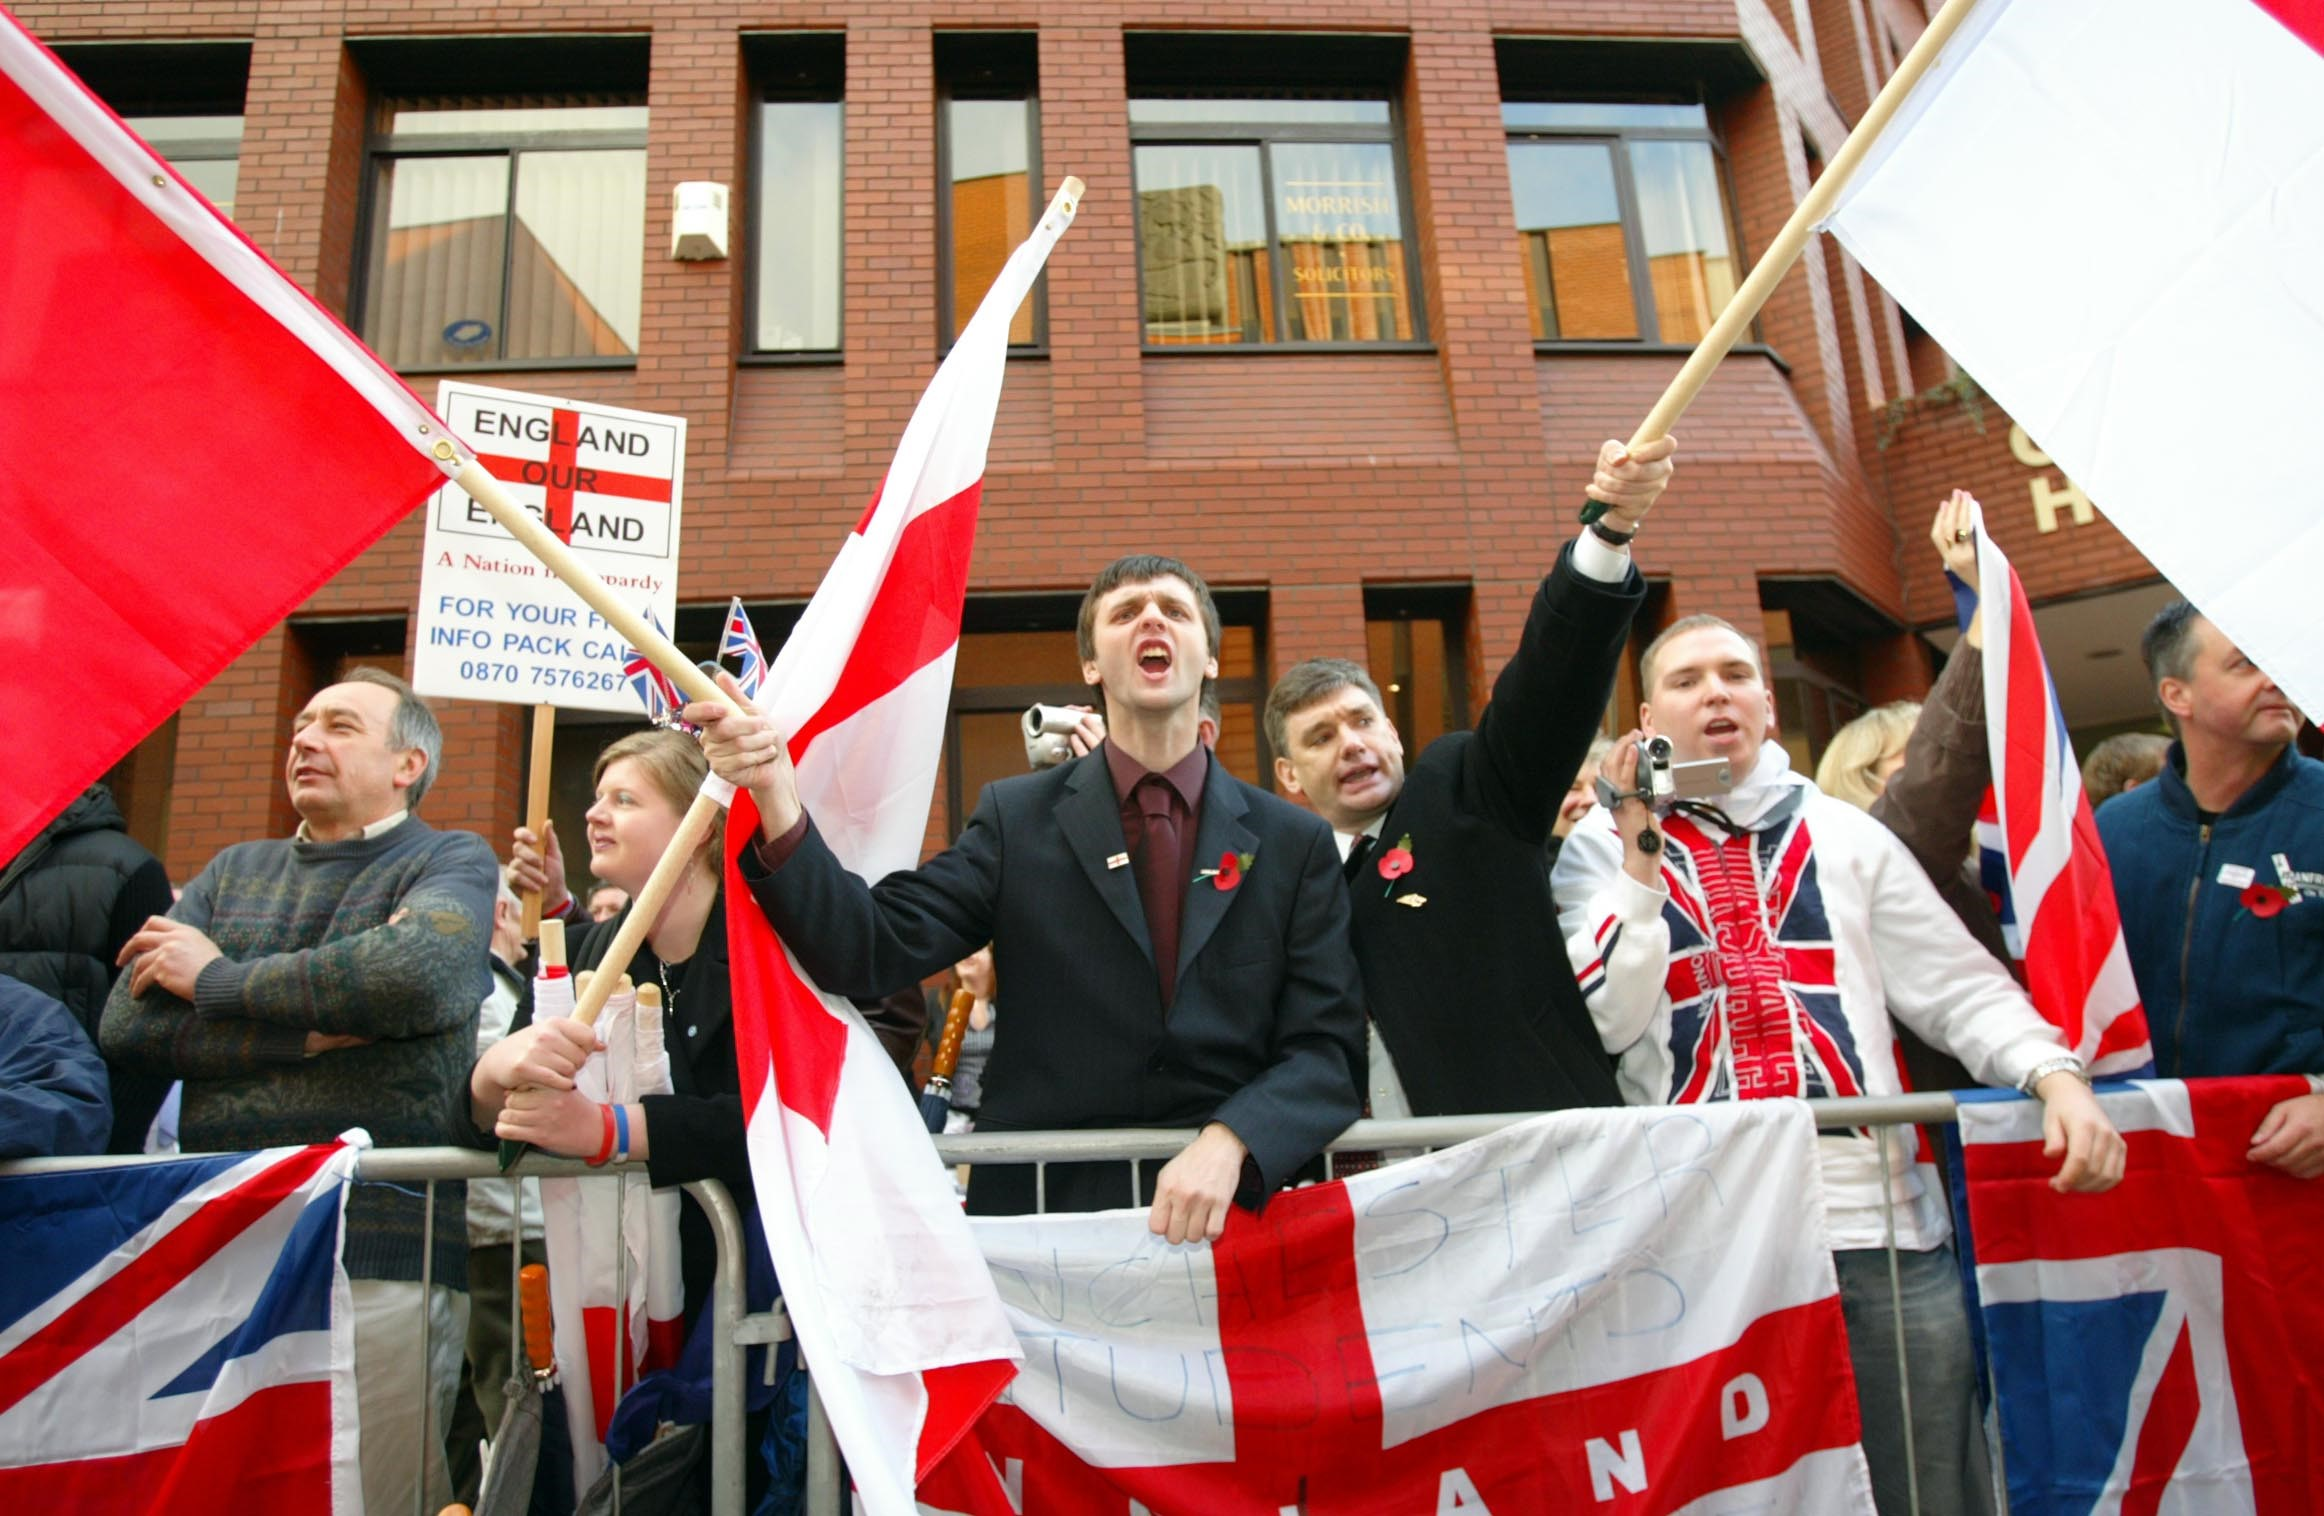 dreta radical UK 3